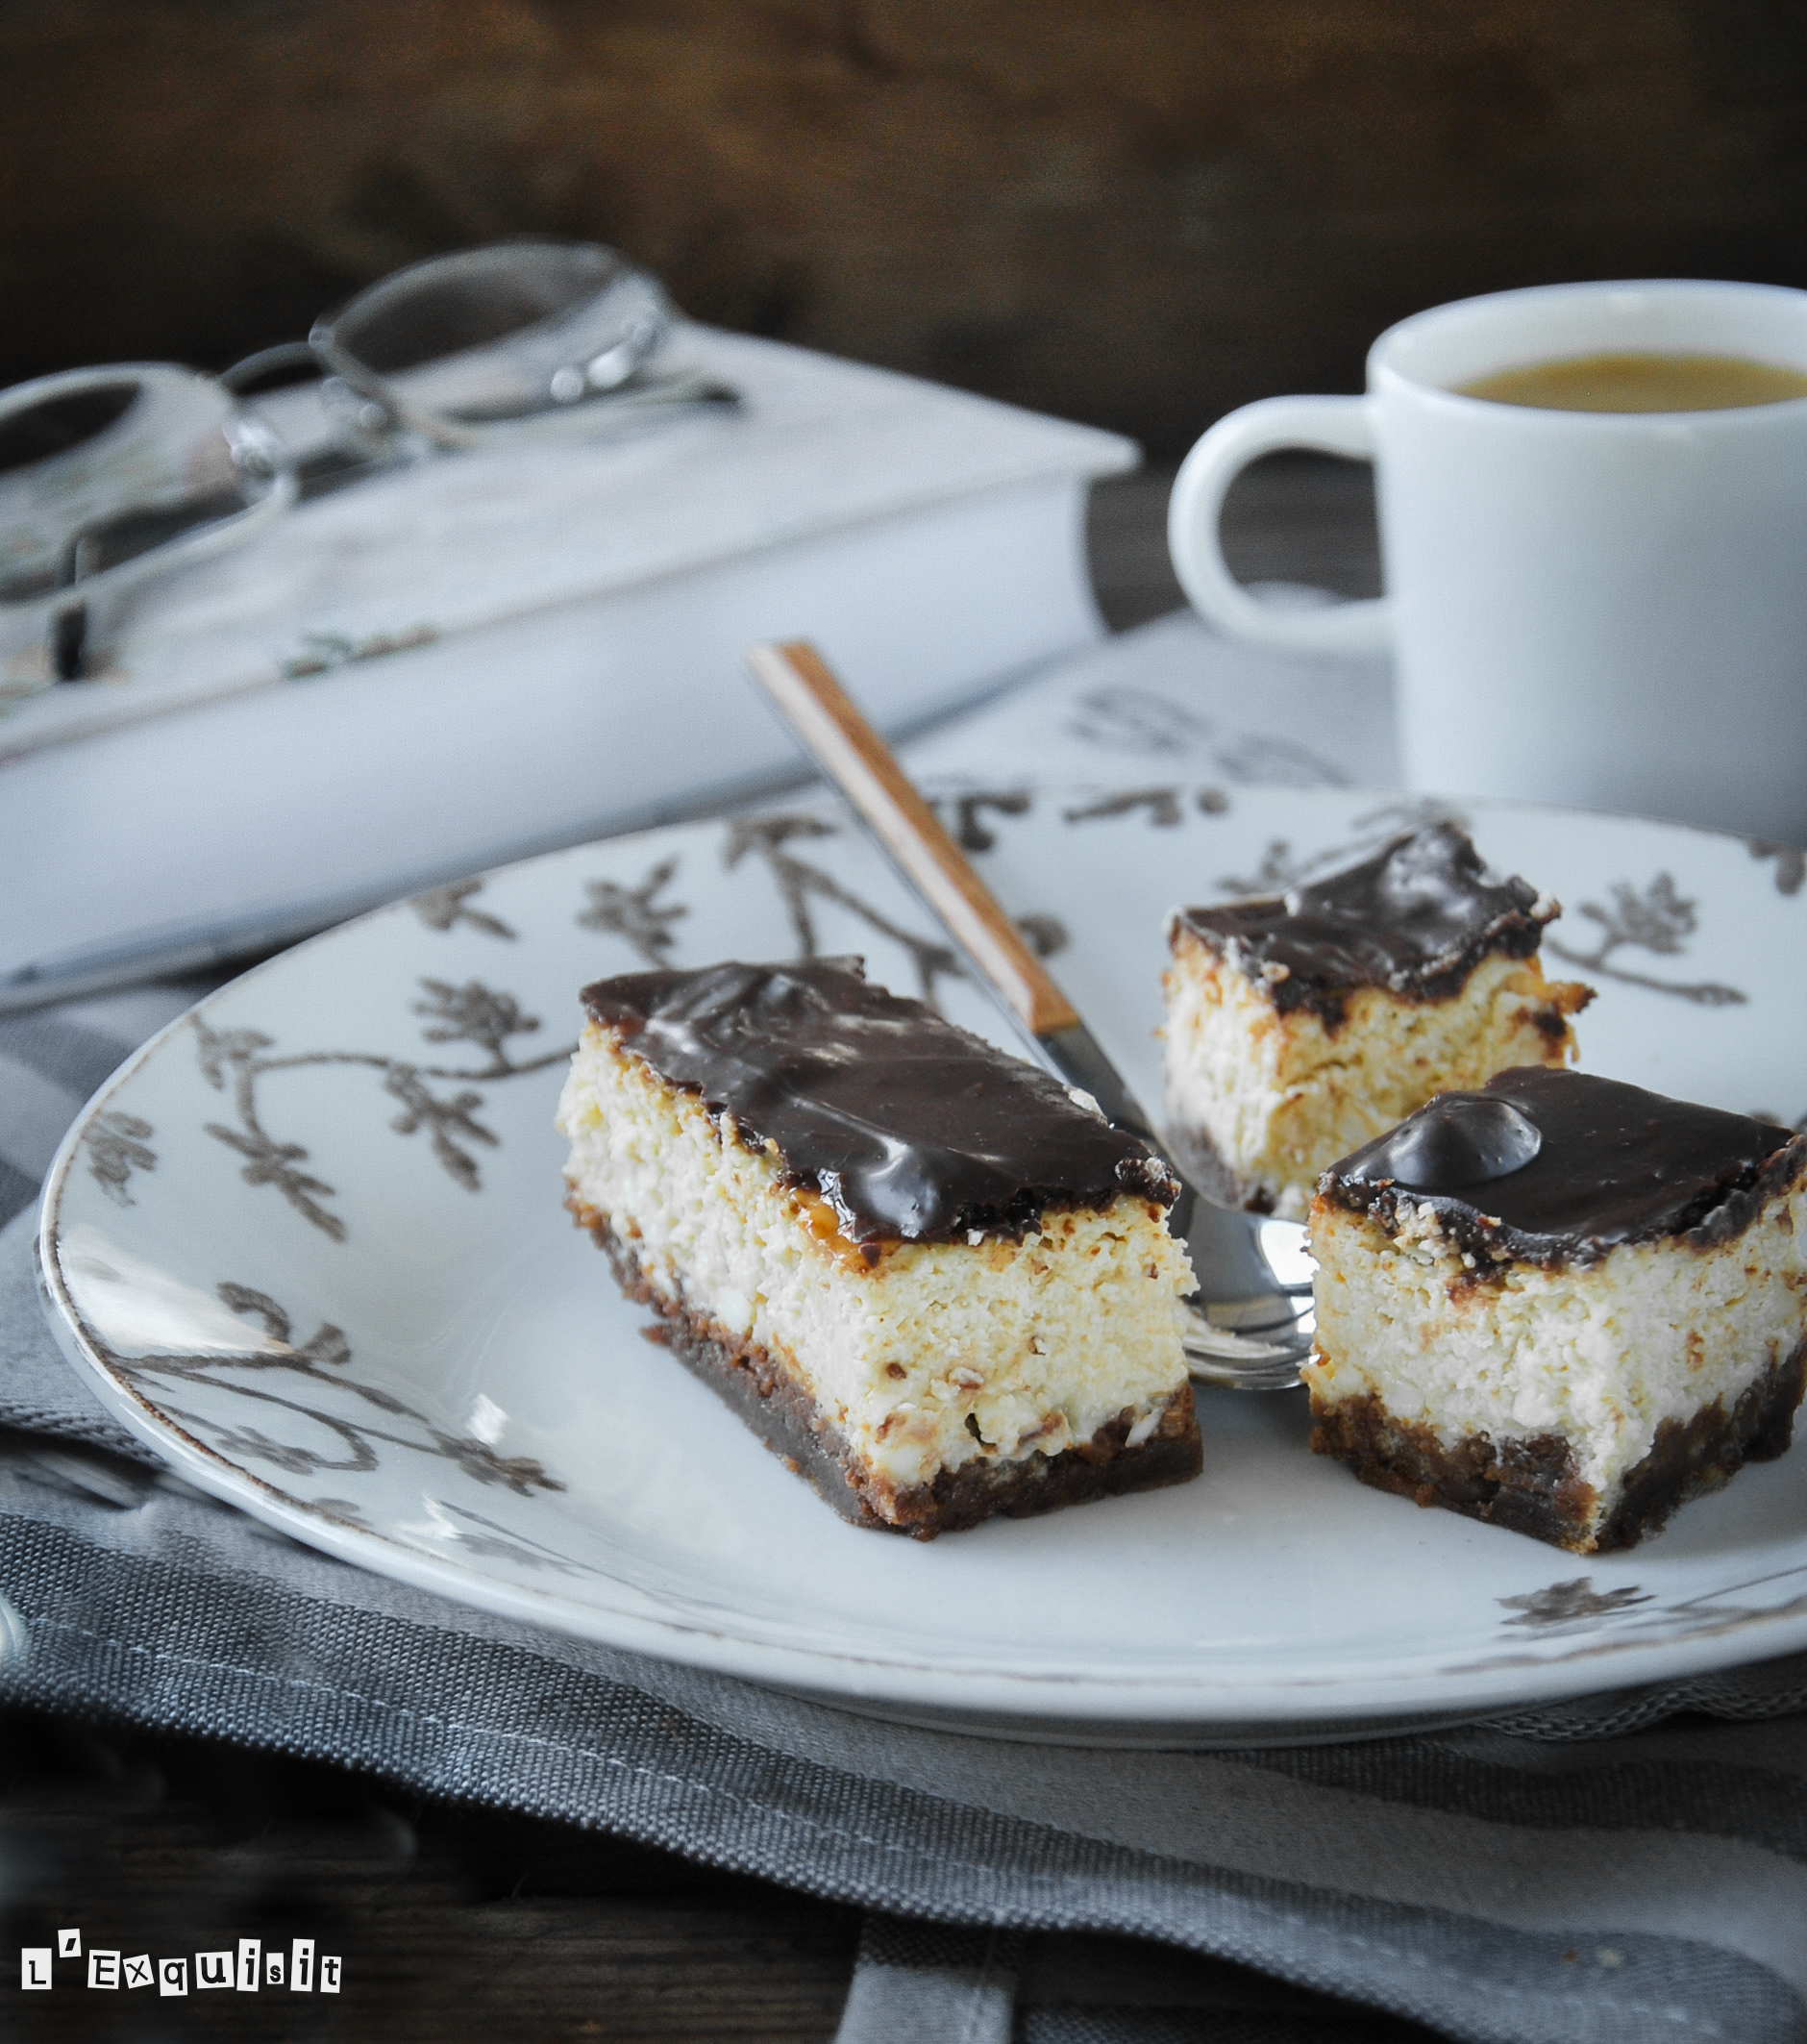 Tarta de queso al café con chocolate